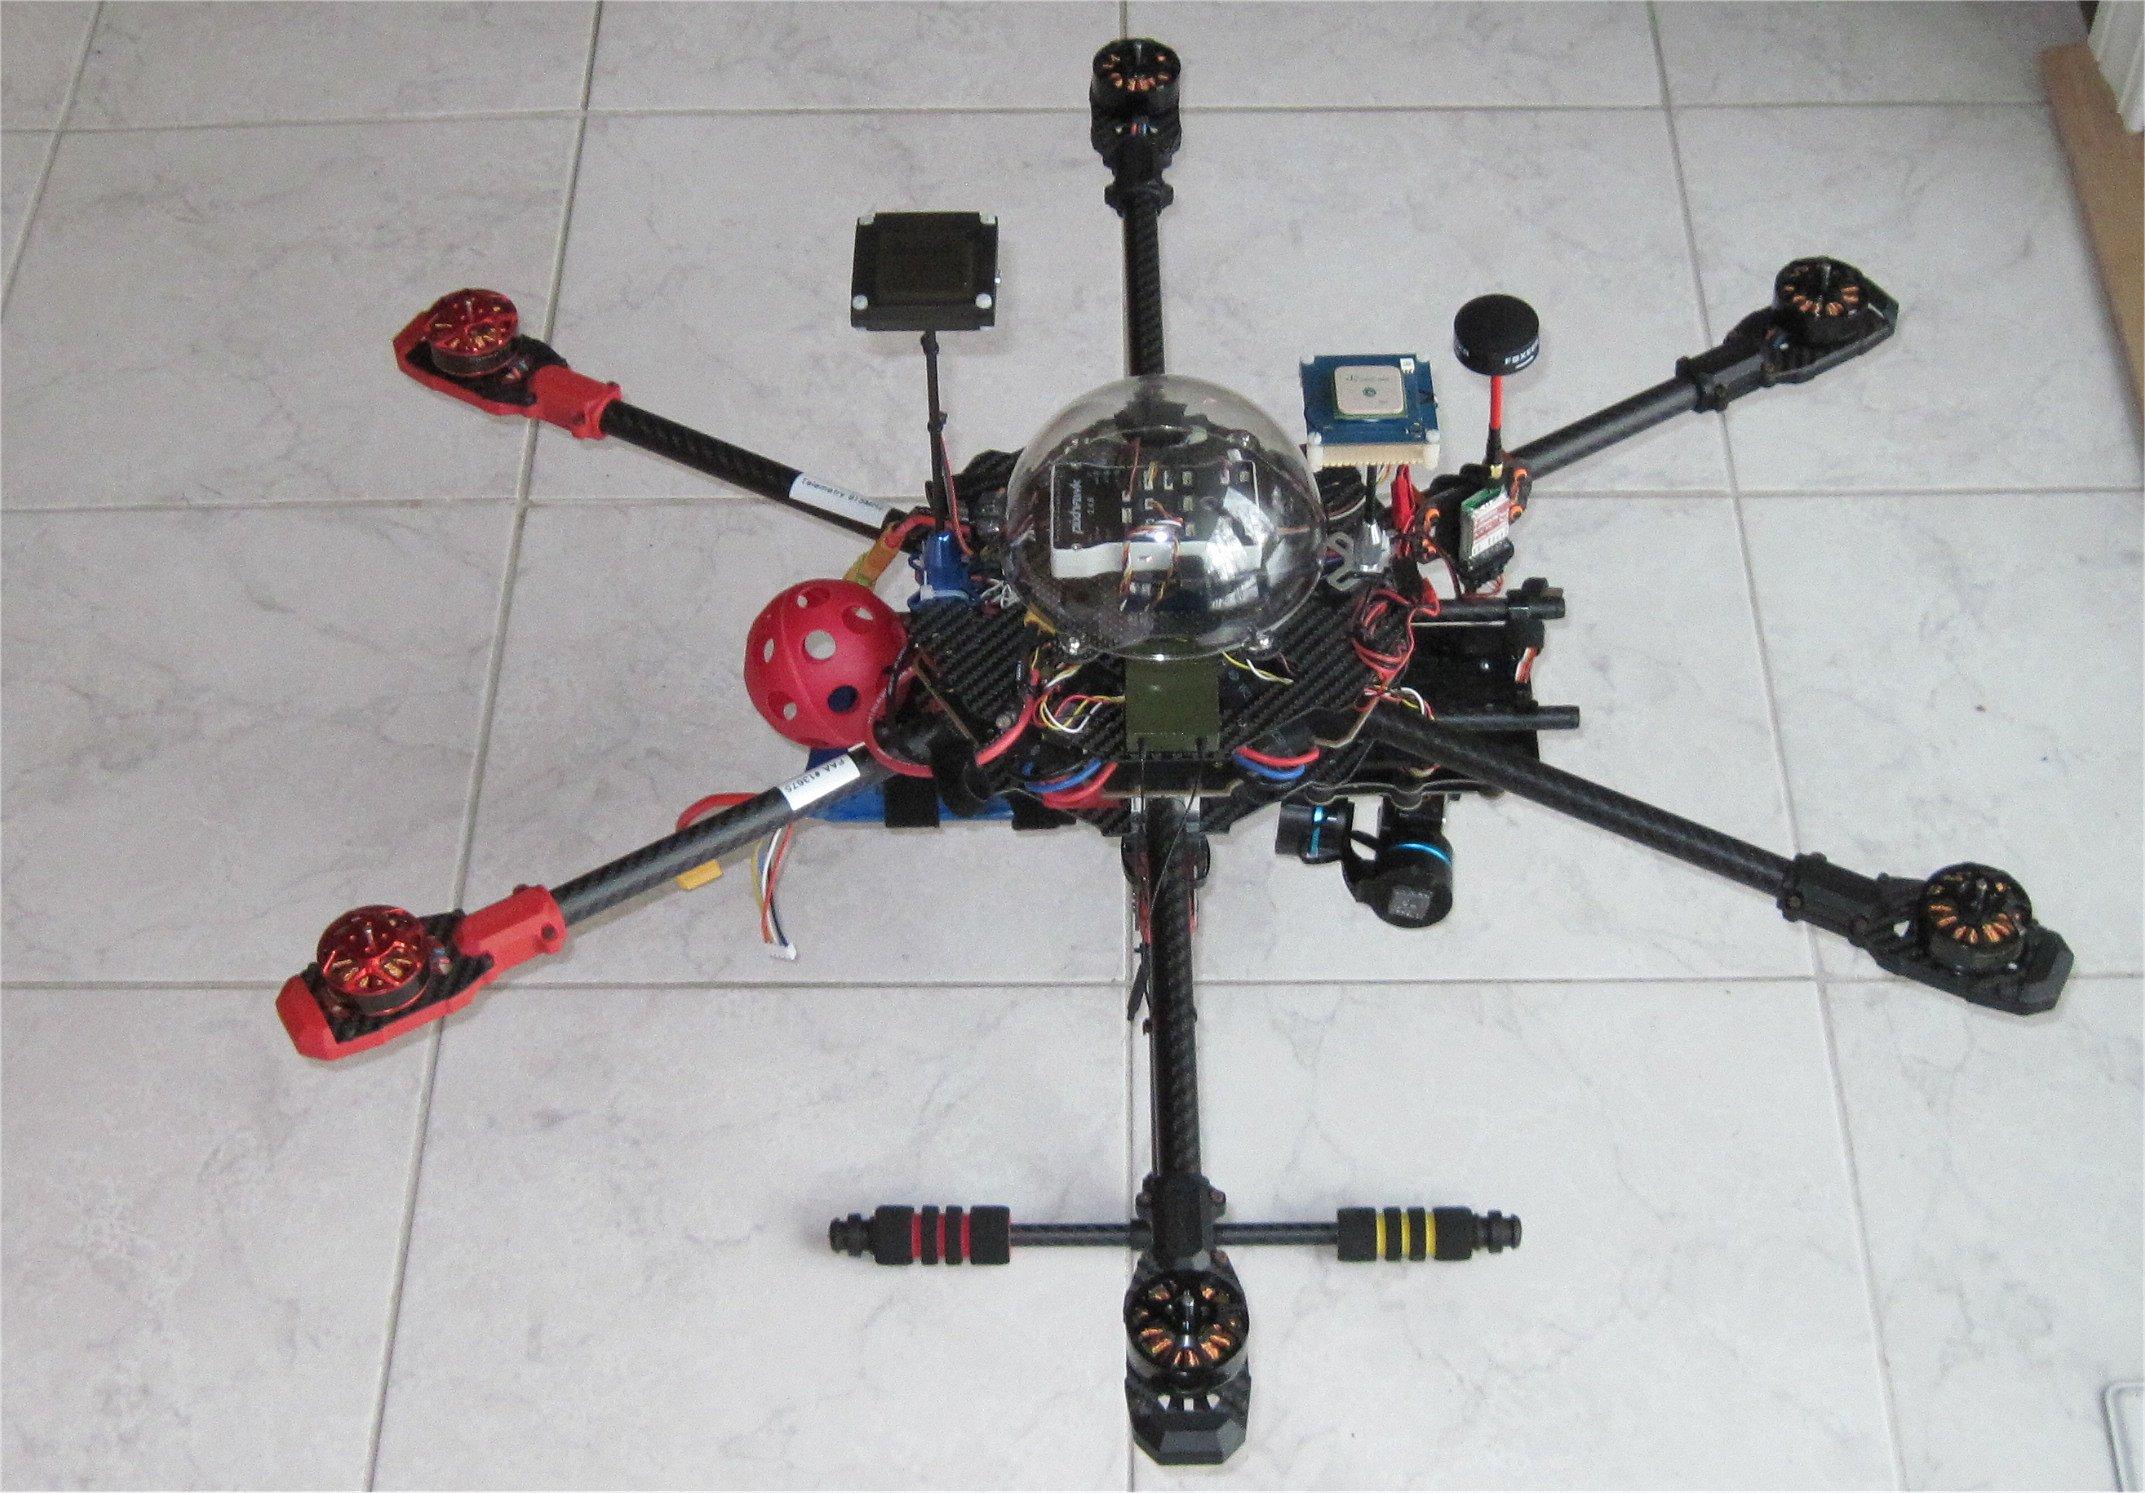 Long range UAV link 100mw for 60KM was designed and tested